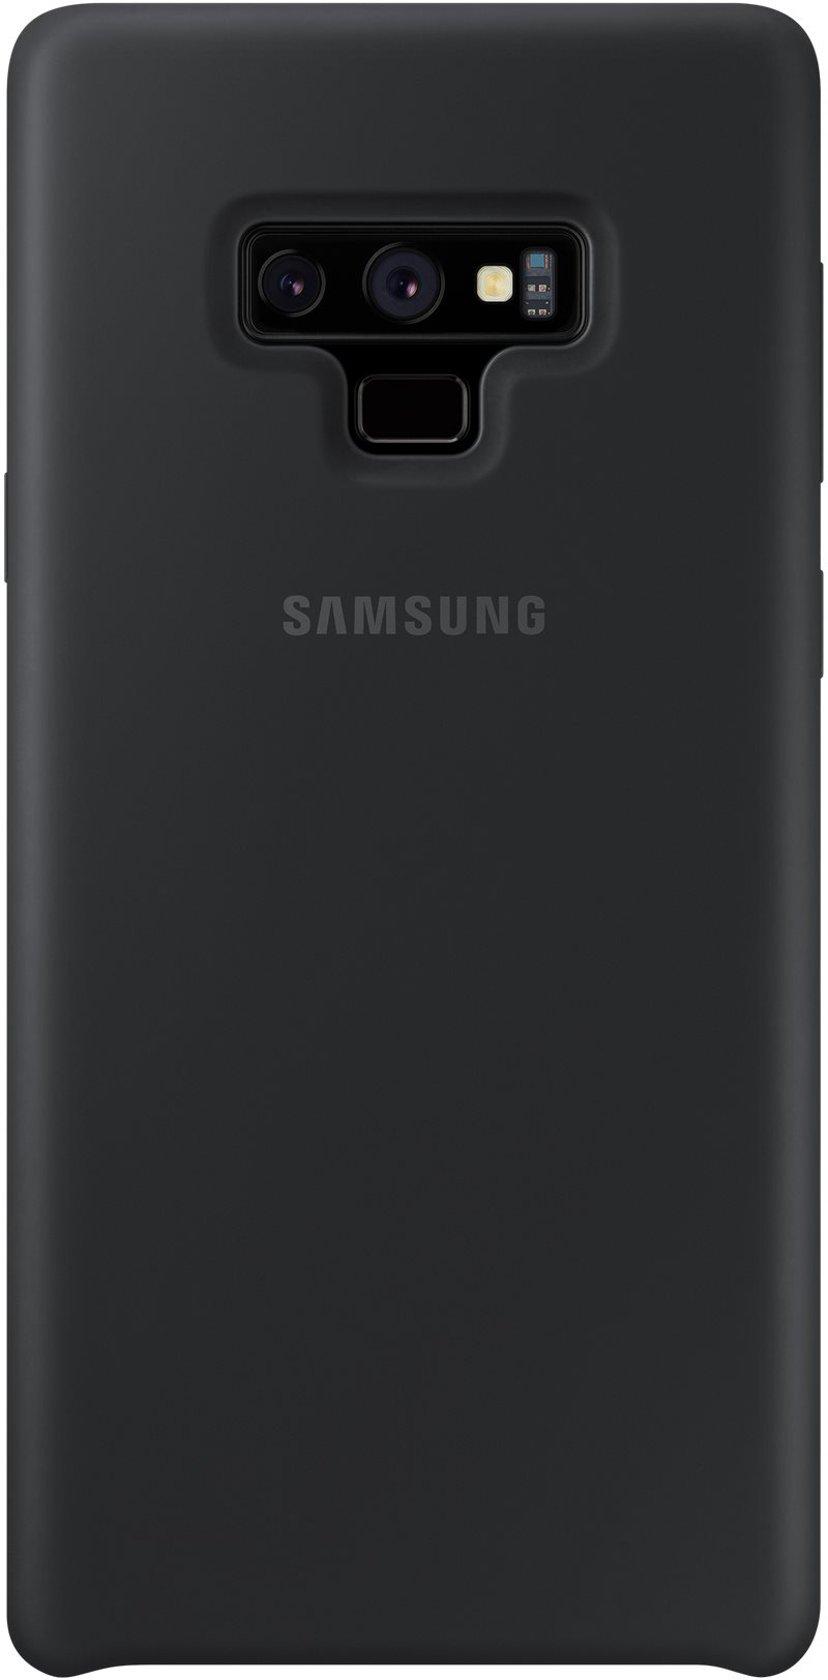 Samsung Soft Touch Silicone Cover EF-PN960 Zwart Samsung Galaxy Note 9